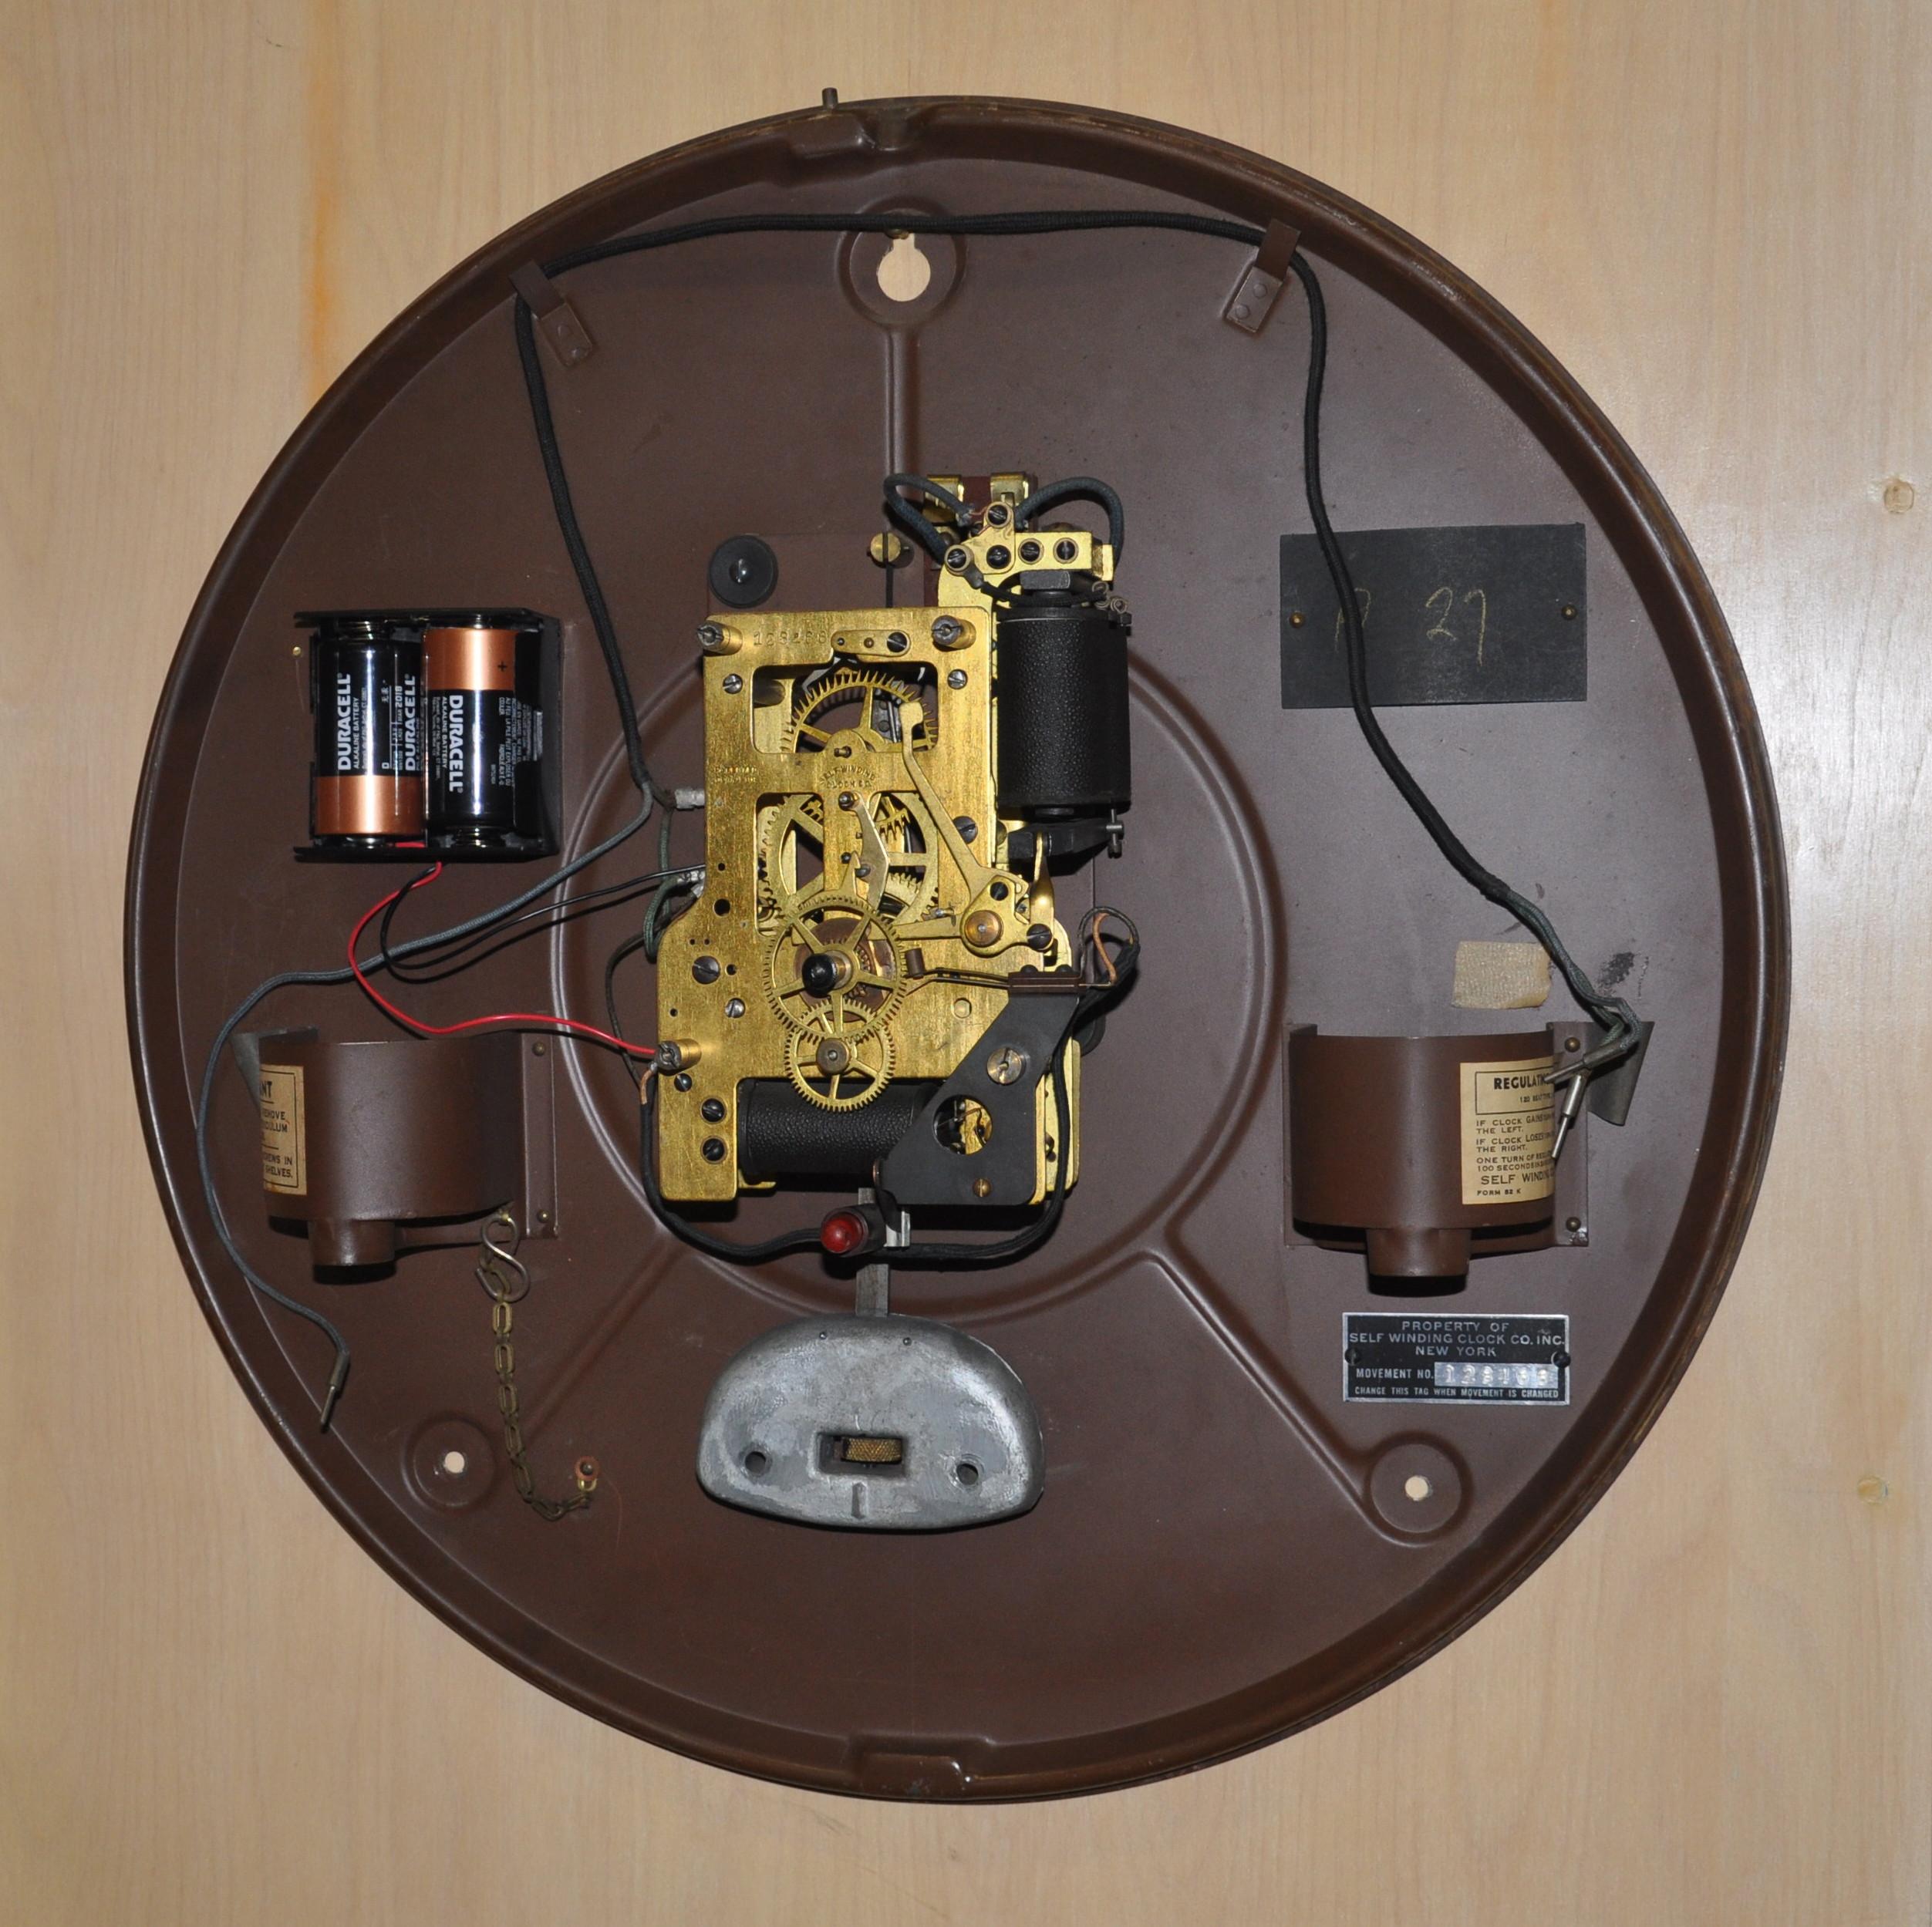 Self_Winding_Clock_Company_Western_Union_clock file self winding clock company western union clock jpg self winding clock wiring diagram at bayanpartner.co